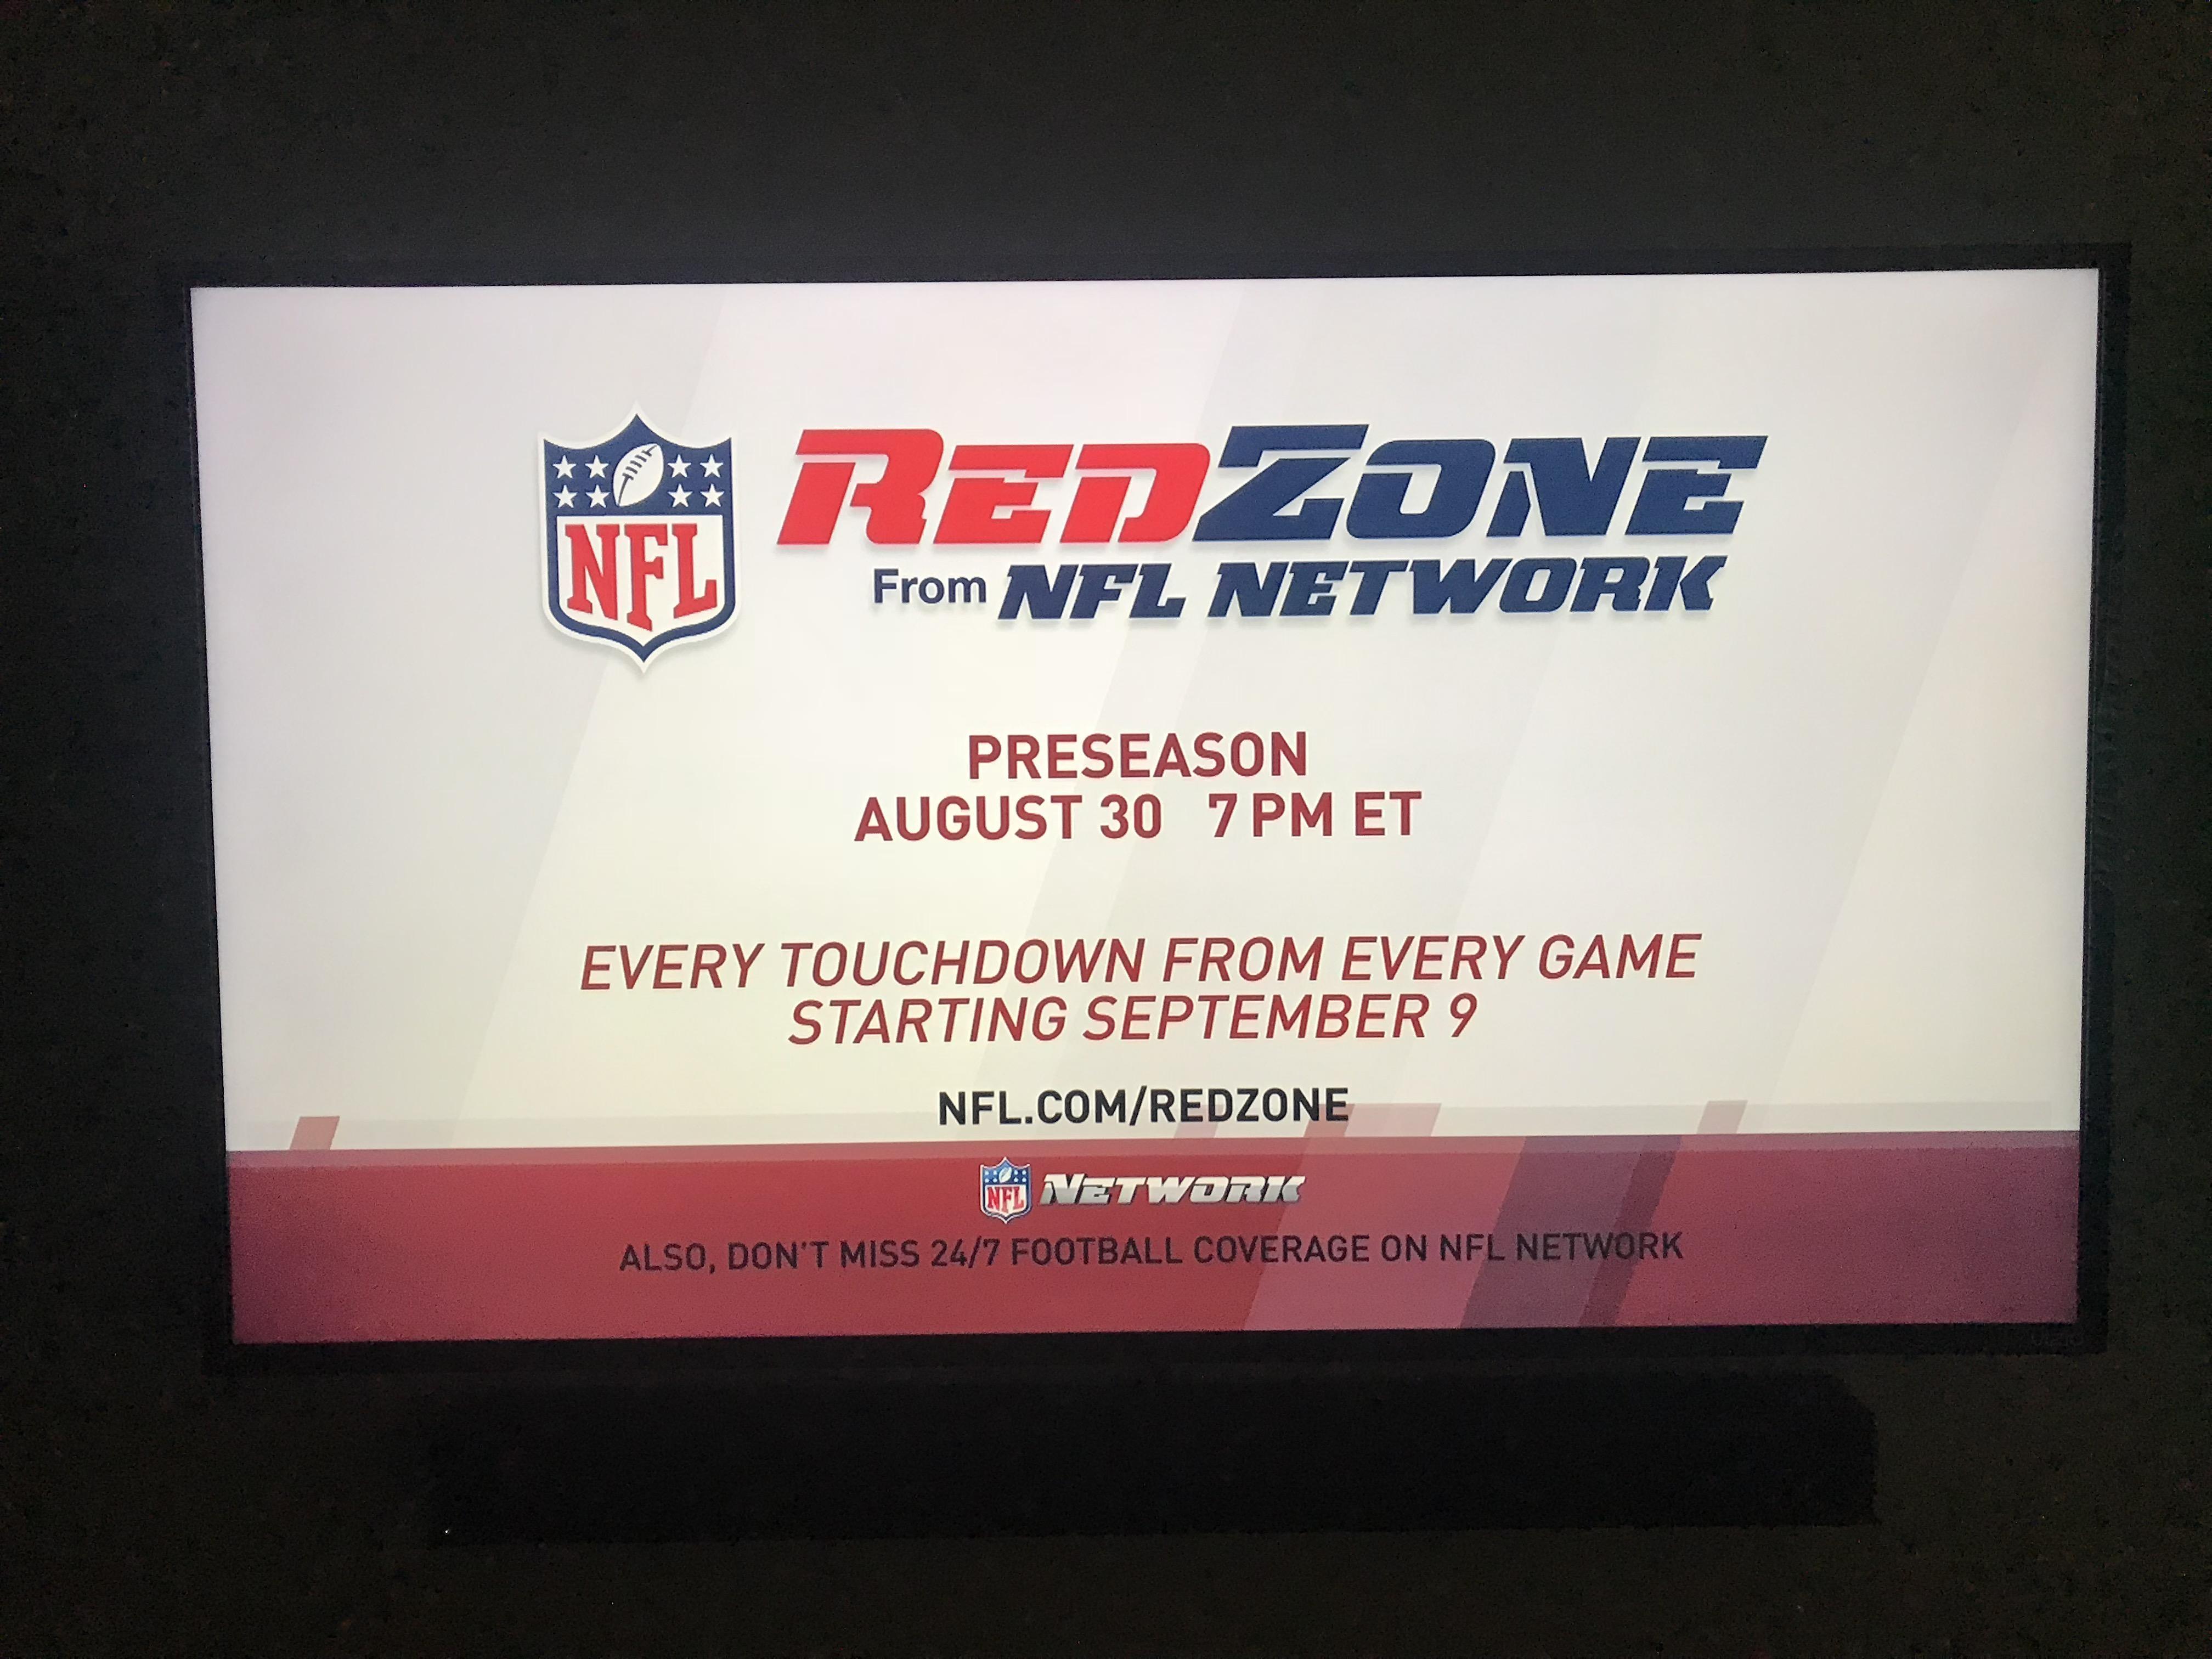 redzone starts aug 30th